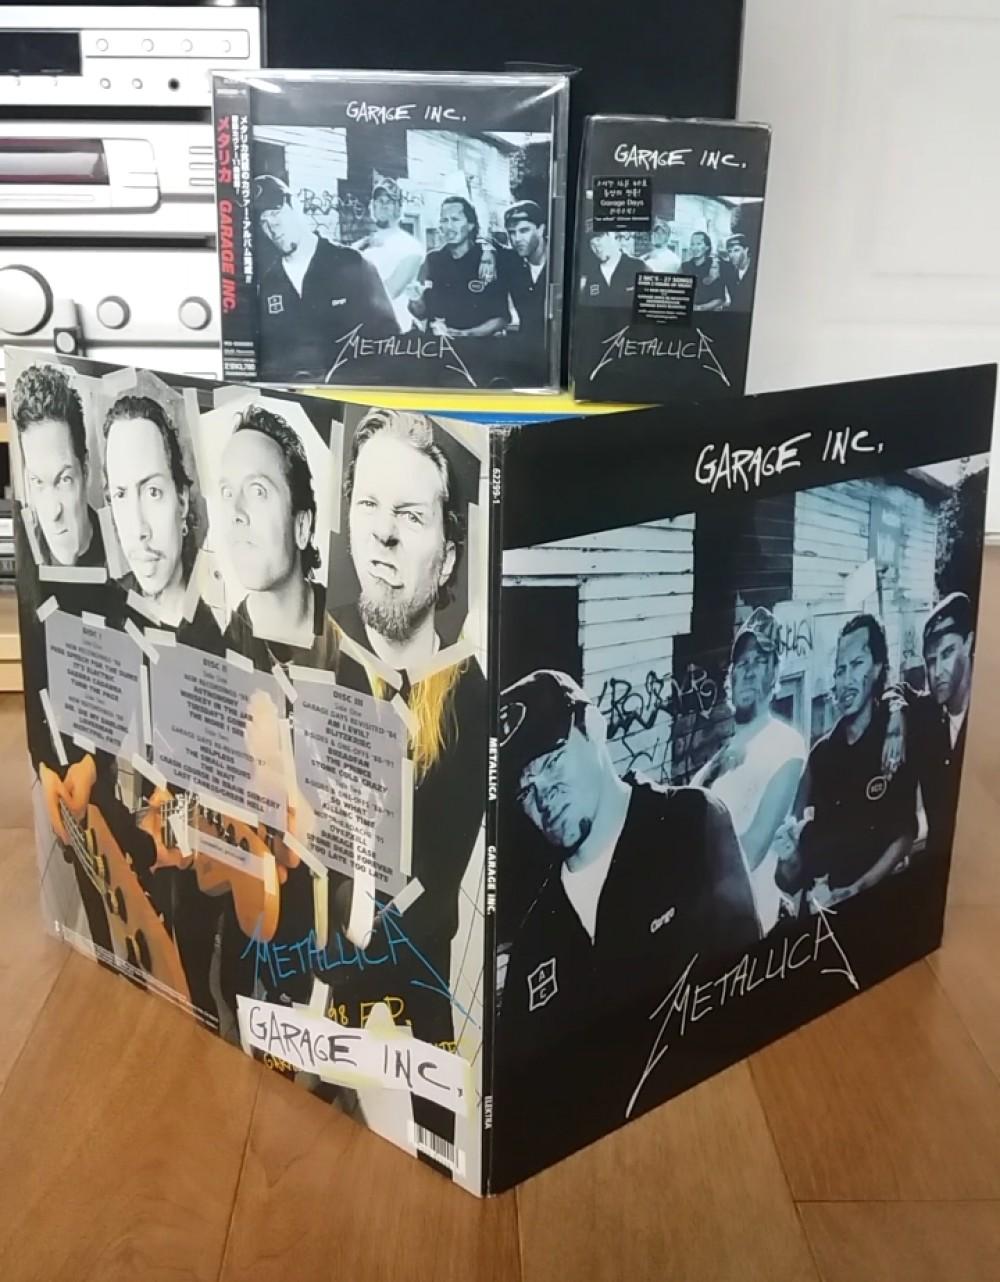 Metallica Garage Inc Vinyl Cd Cassette Photo Metal Kingdom